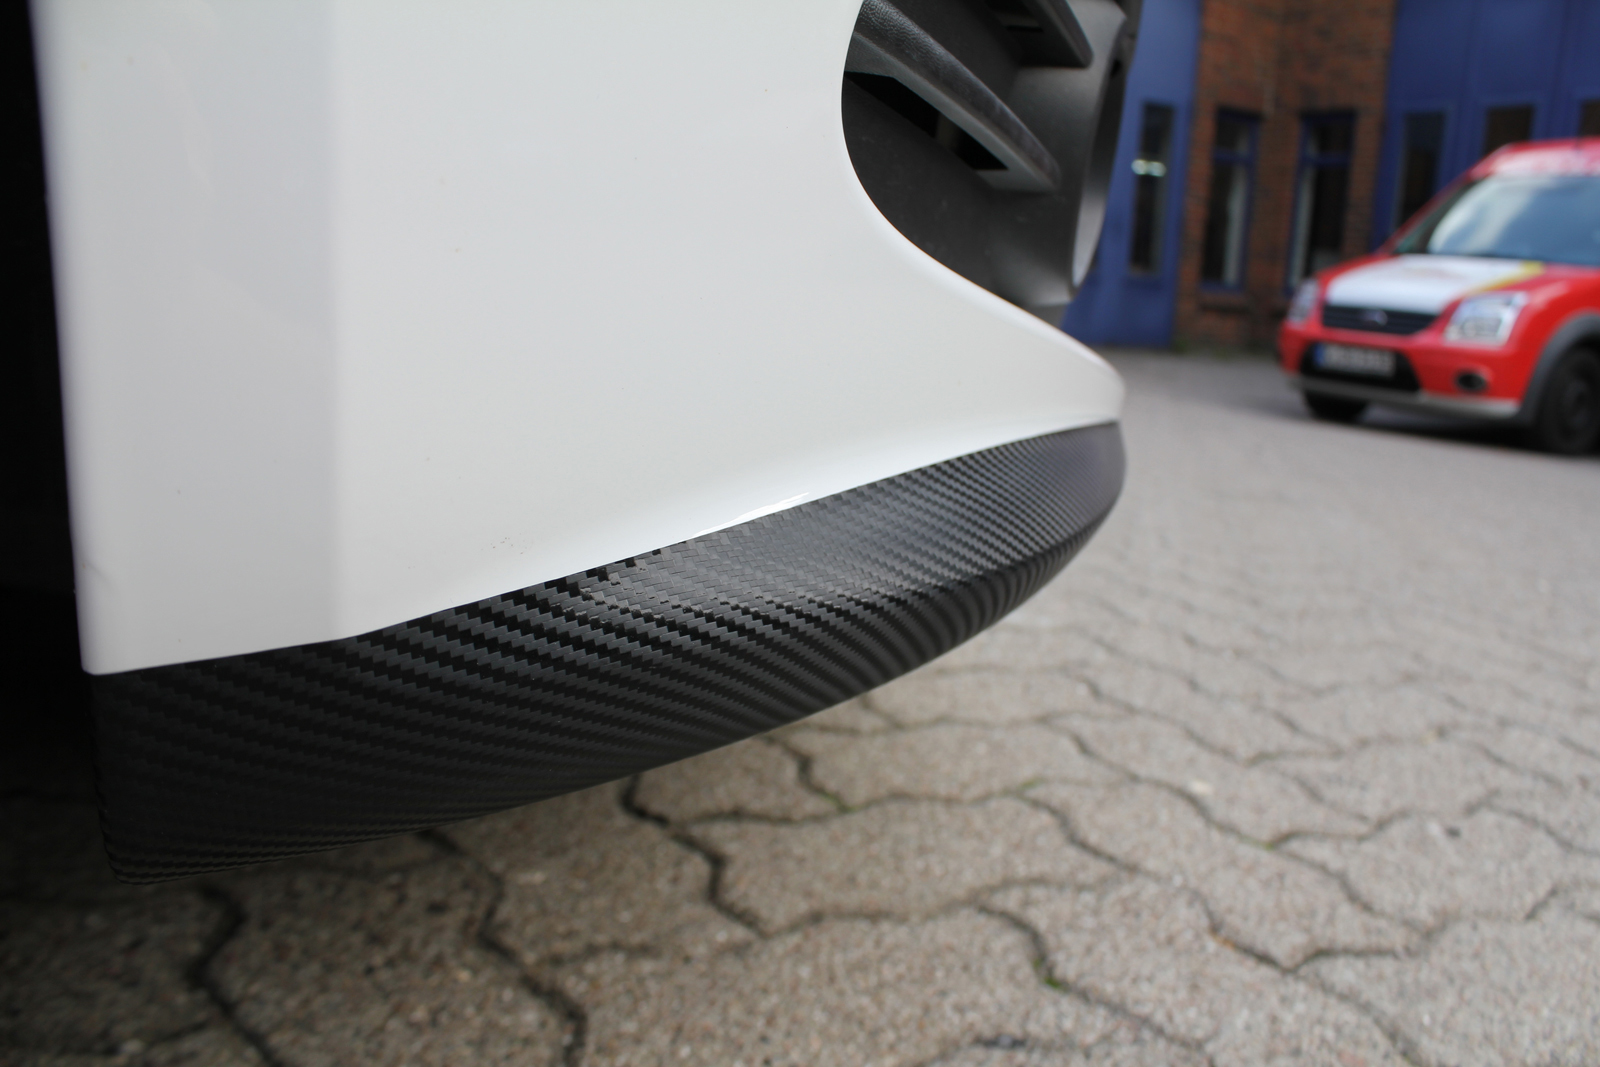 VW_SCIROCCO_FOLIERUNG_CARBON_DACH_HAUBE_04